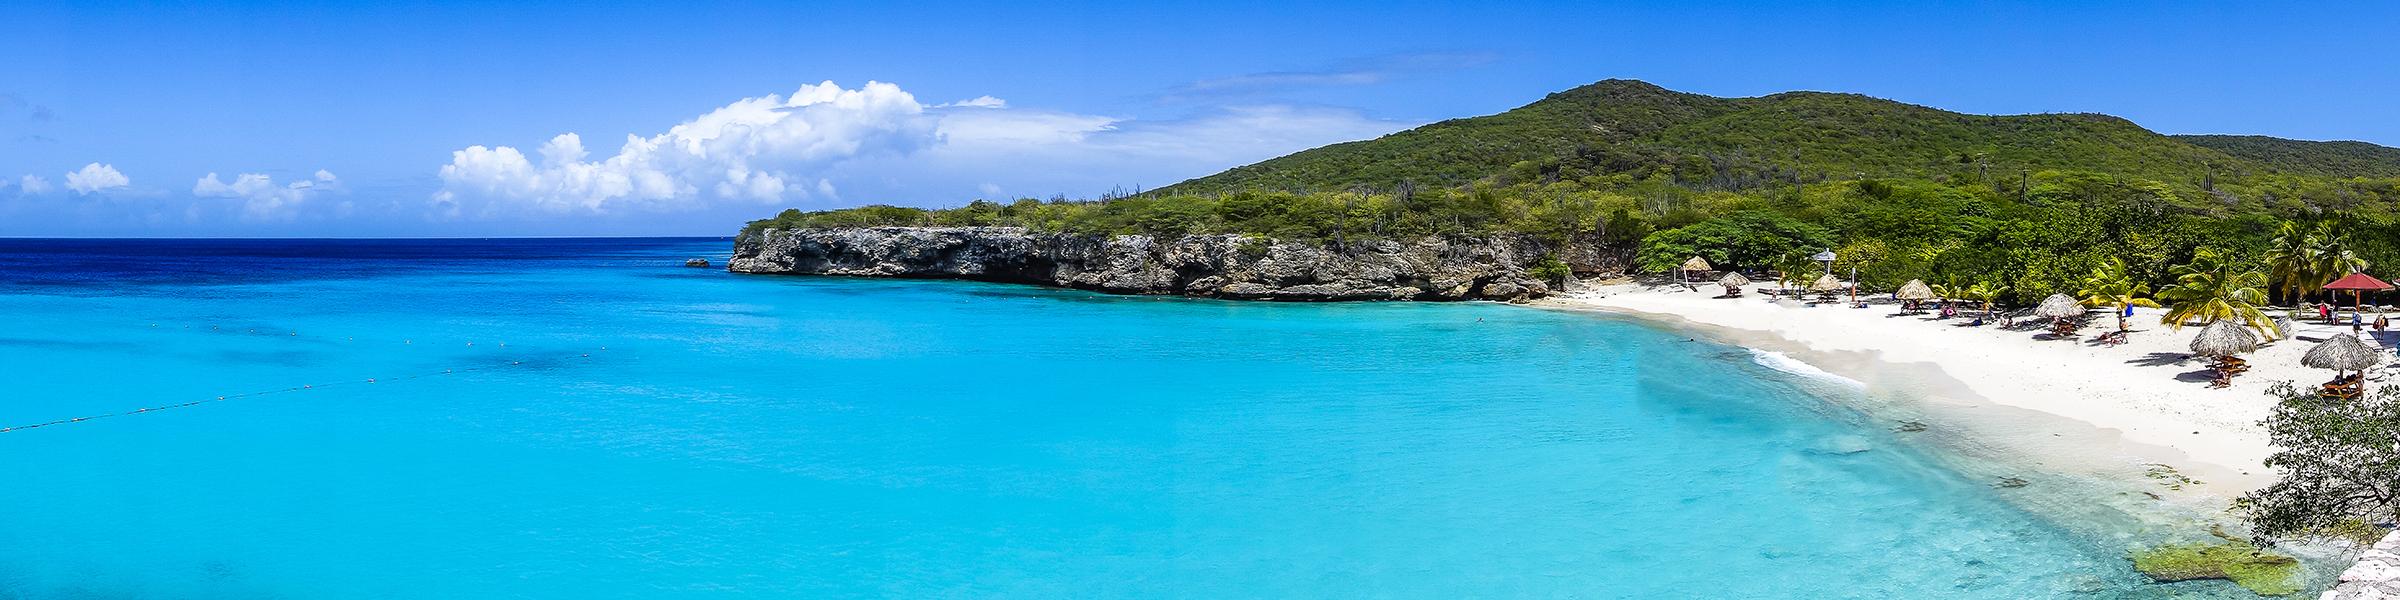 Curaçao Knip Beach